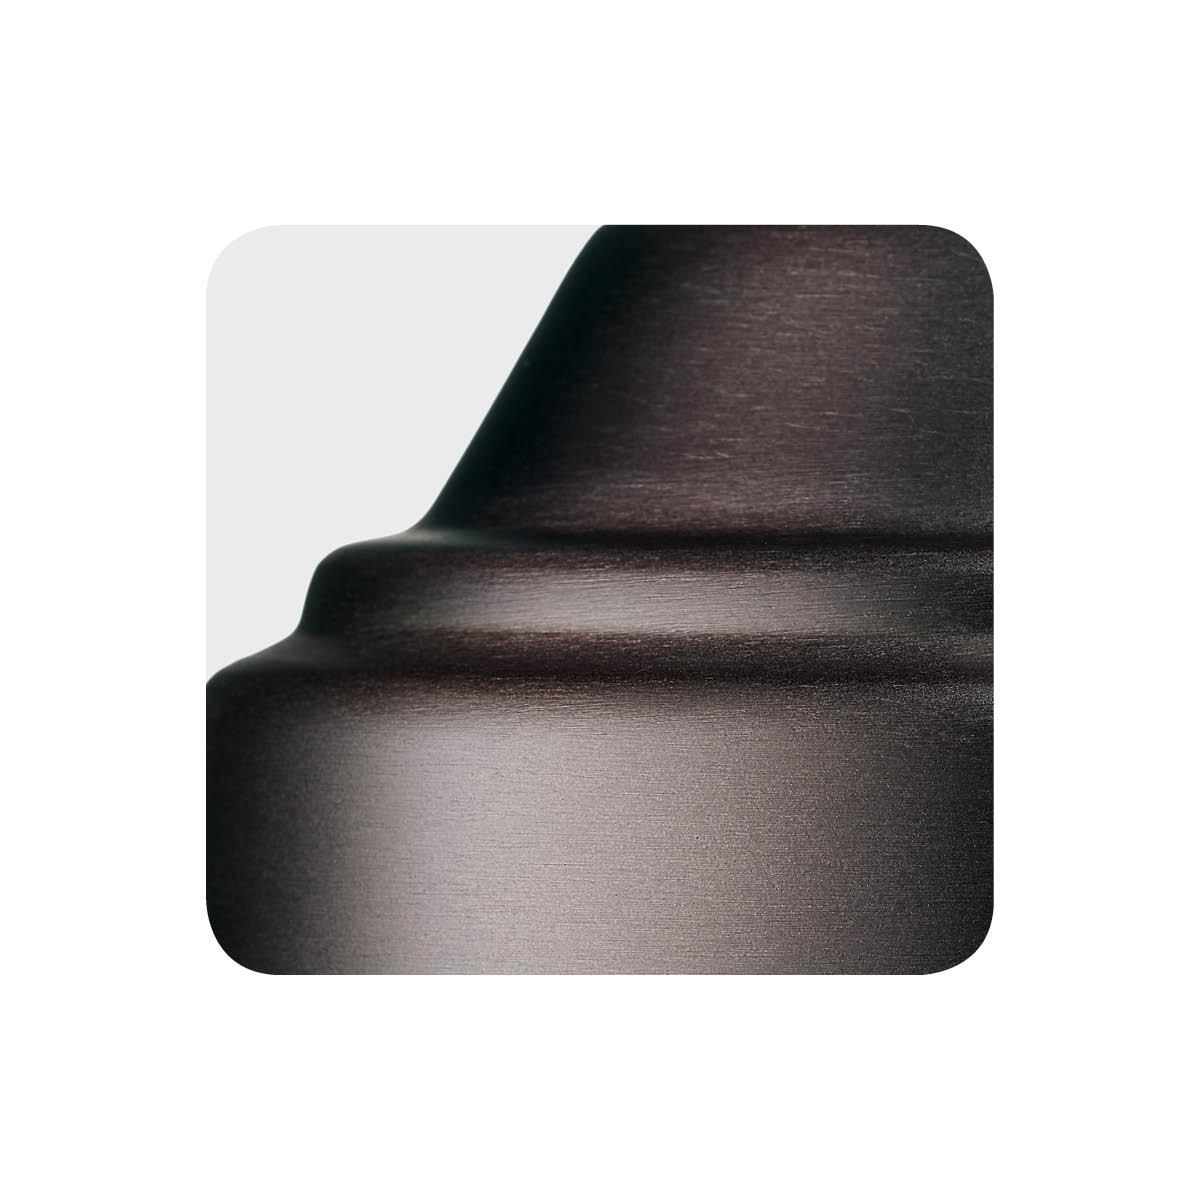 Oil-rubbed bronze alternative metal finish sample